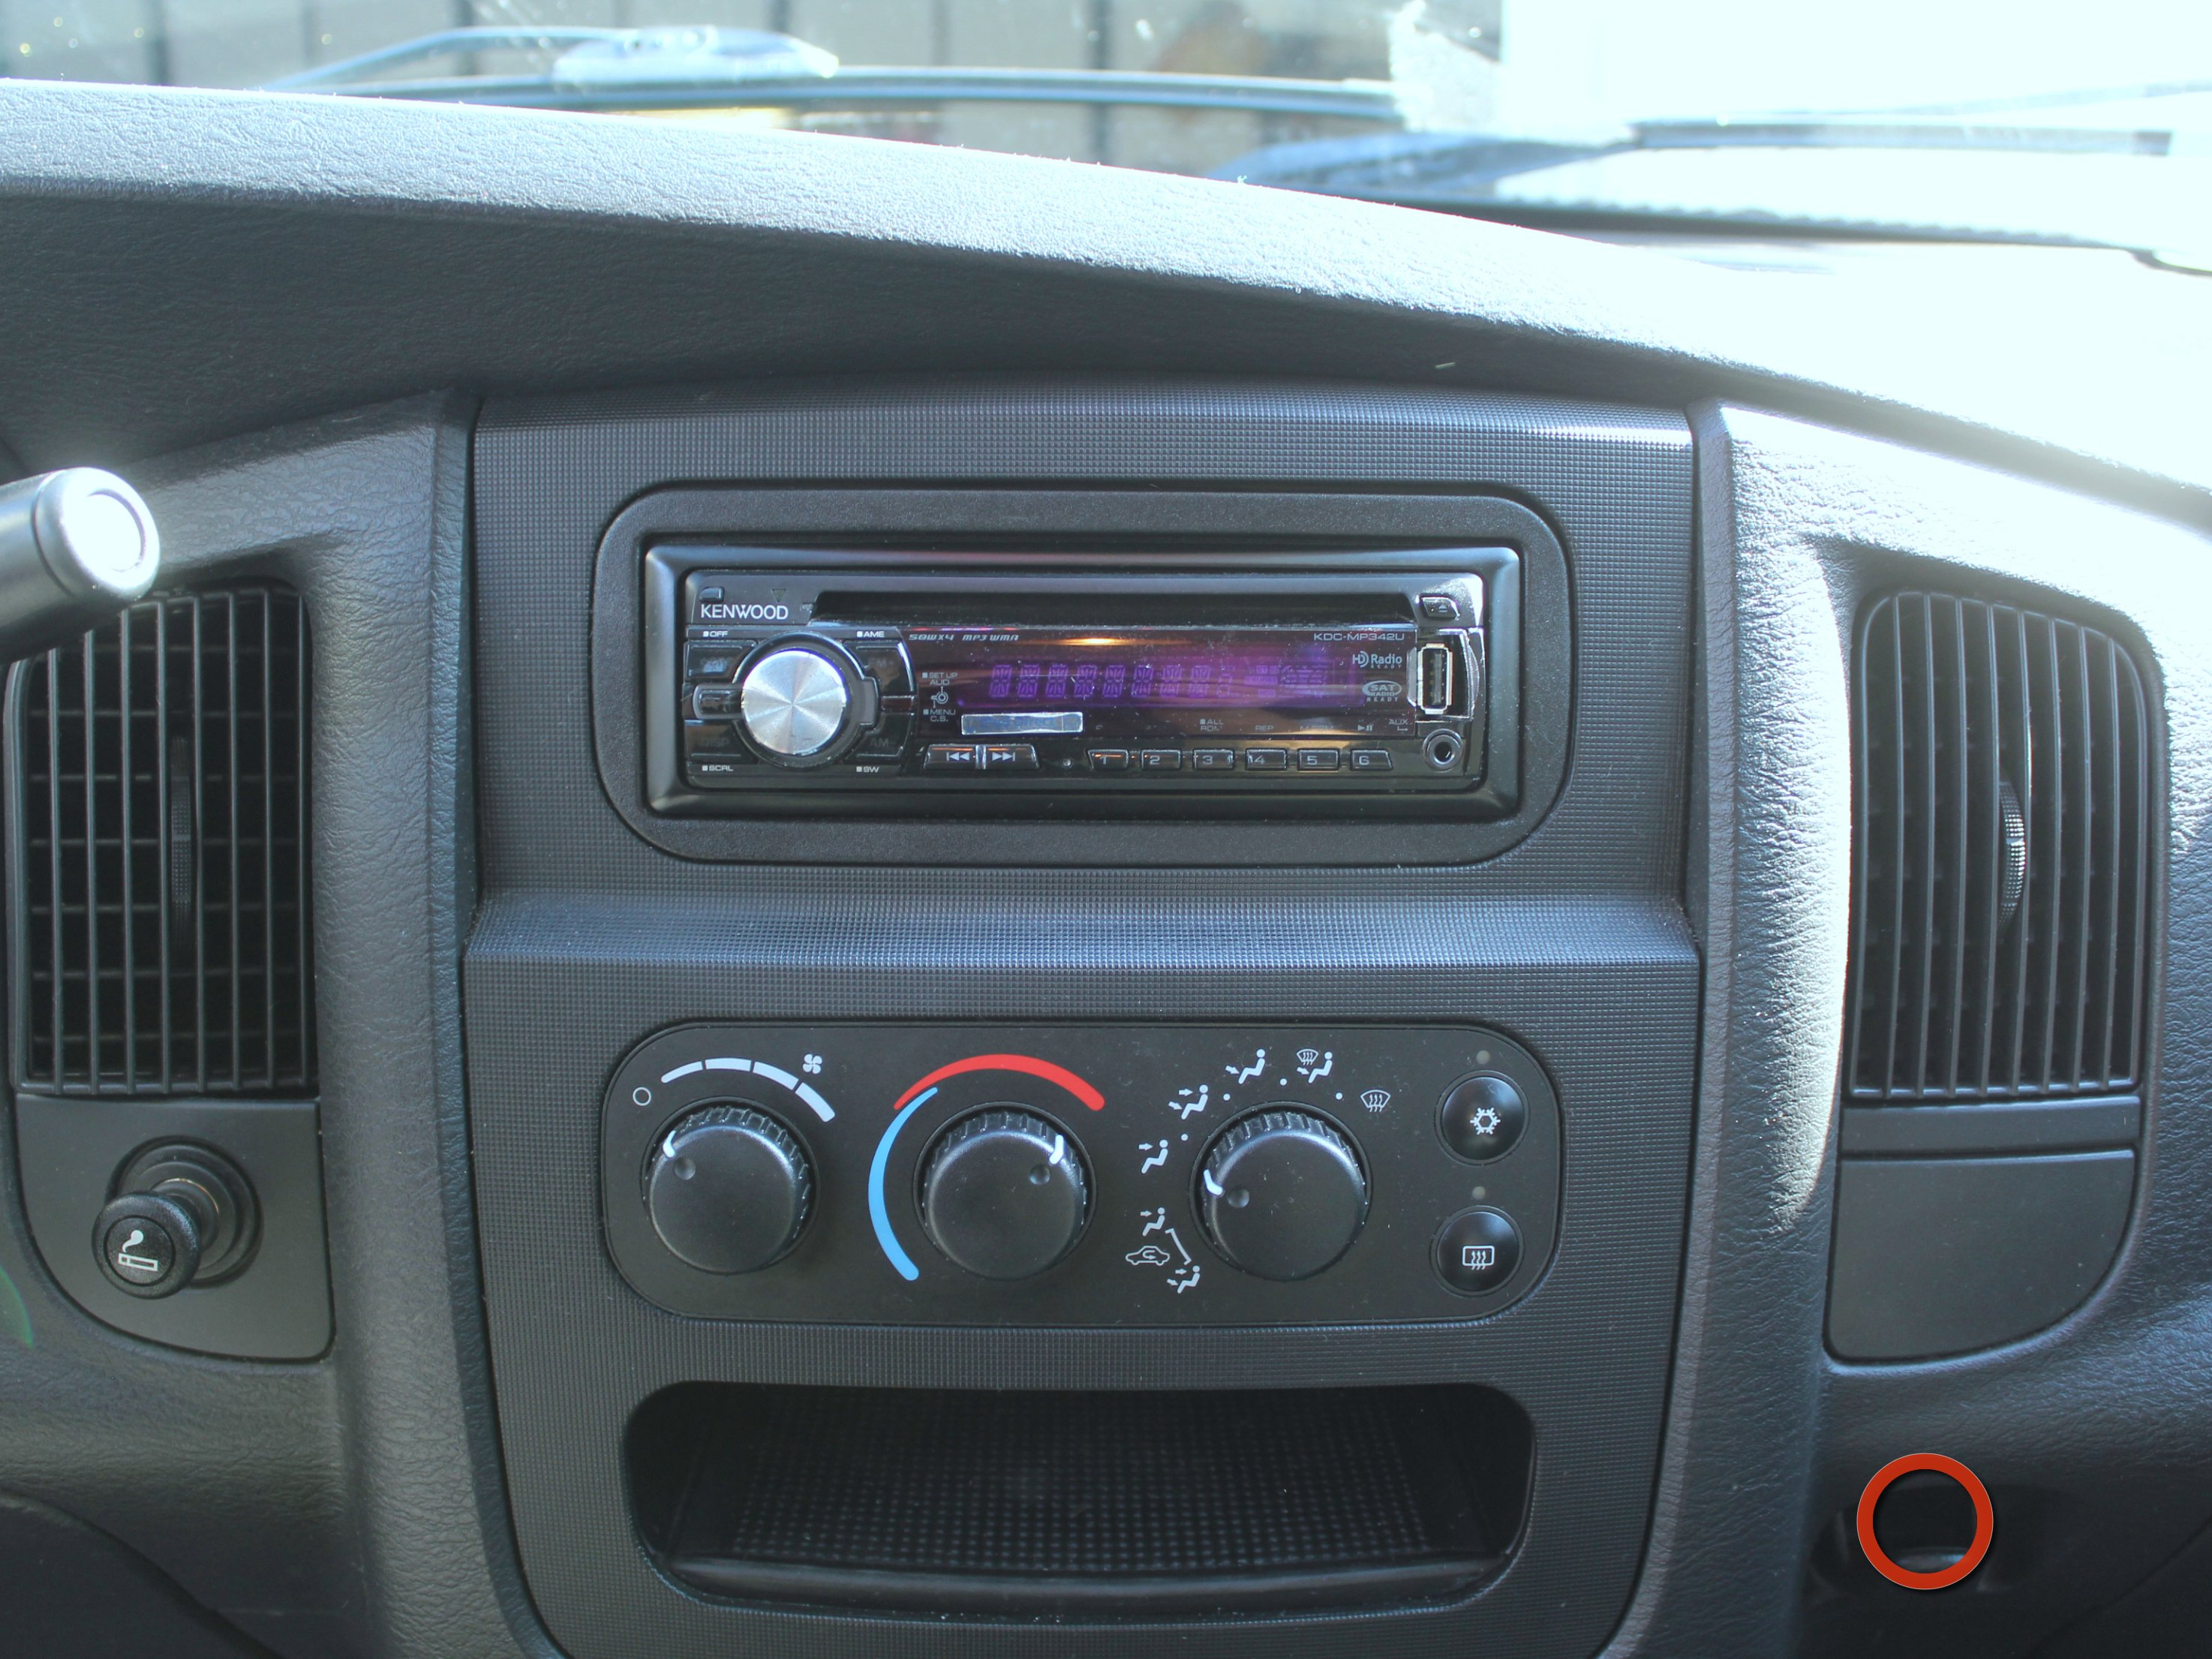 2005 Dodge Ram 1500 Radio Wiring Harness from d3nevzfk7ii3be.cloudfront.net